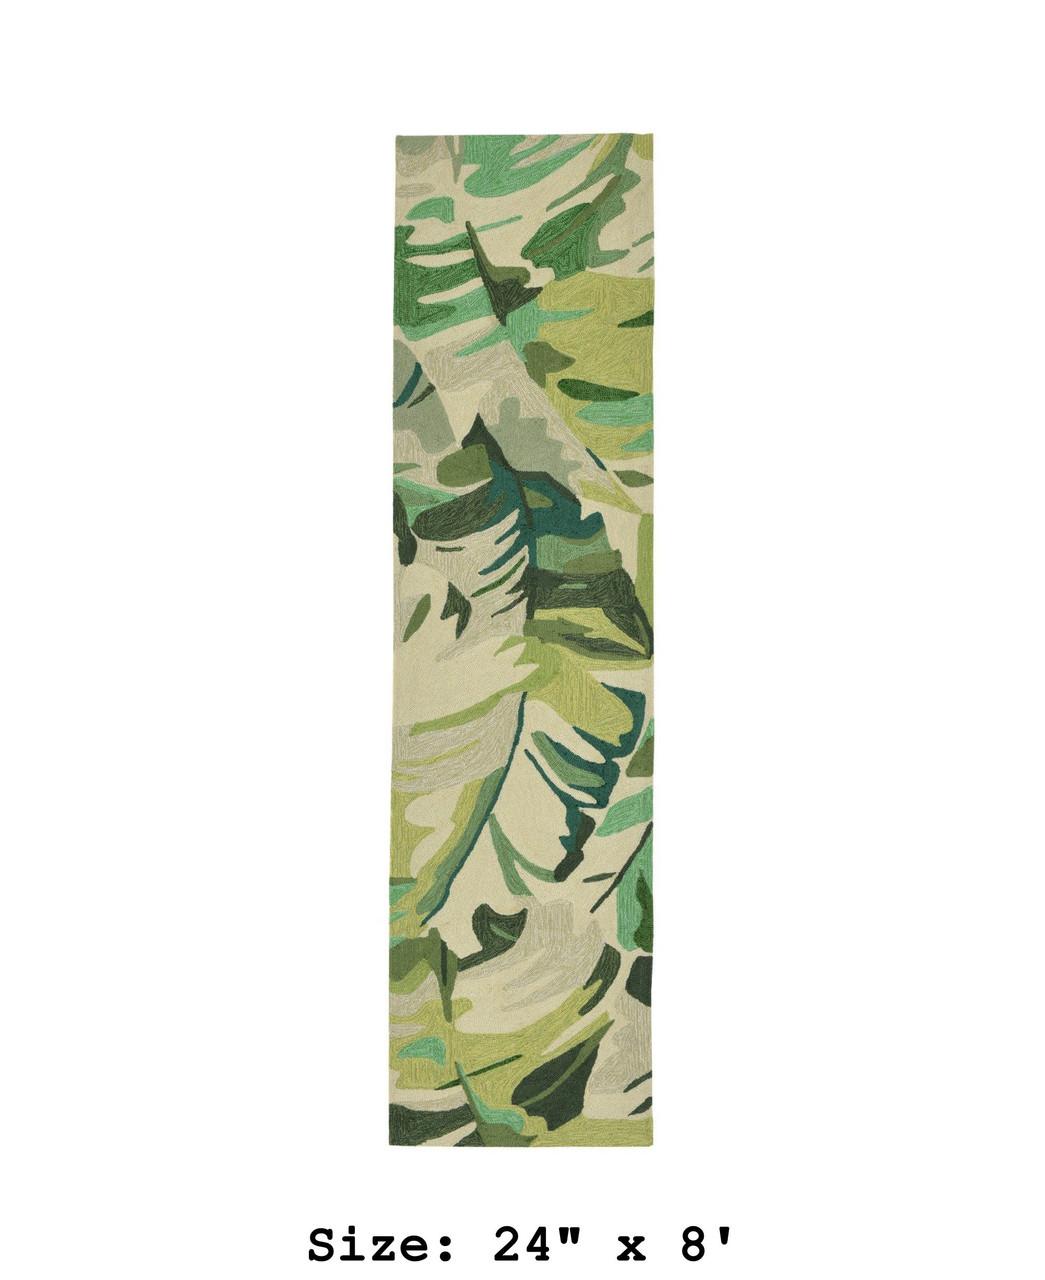 Green Capri Palm Leaf Indoor/Outdoor Rug - Runner